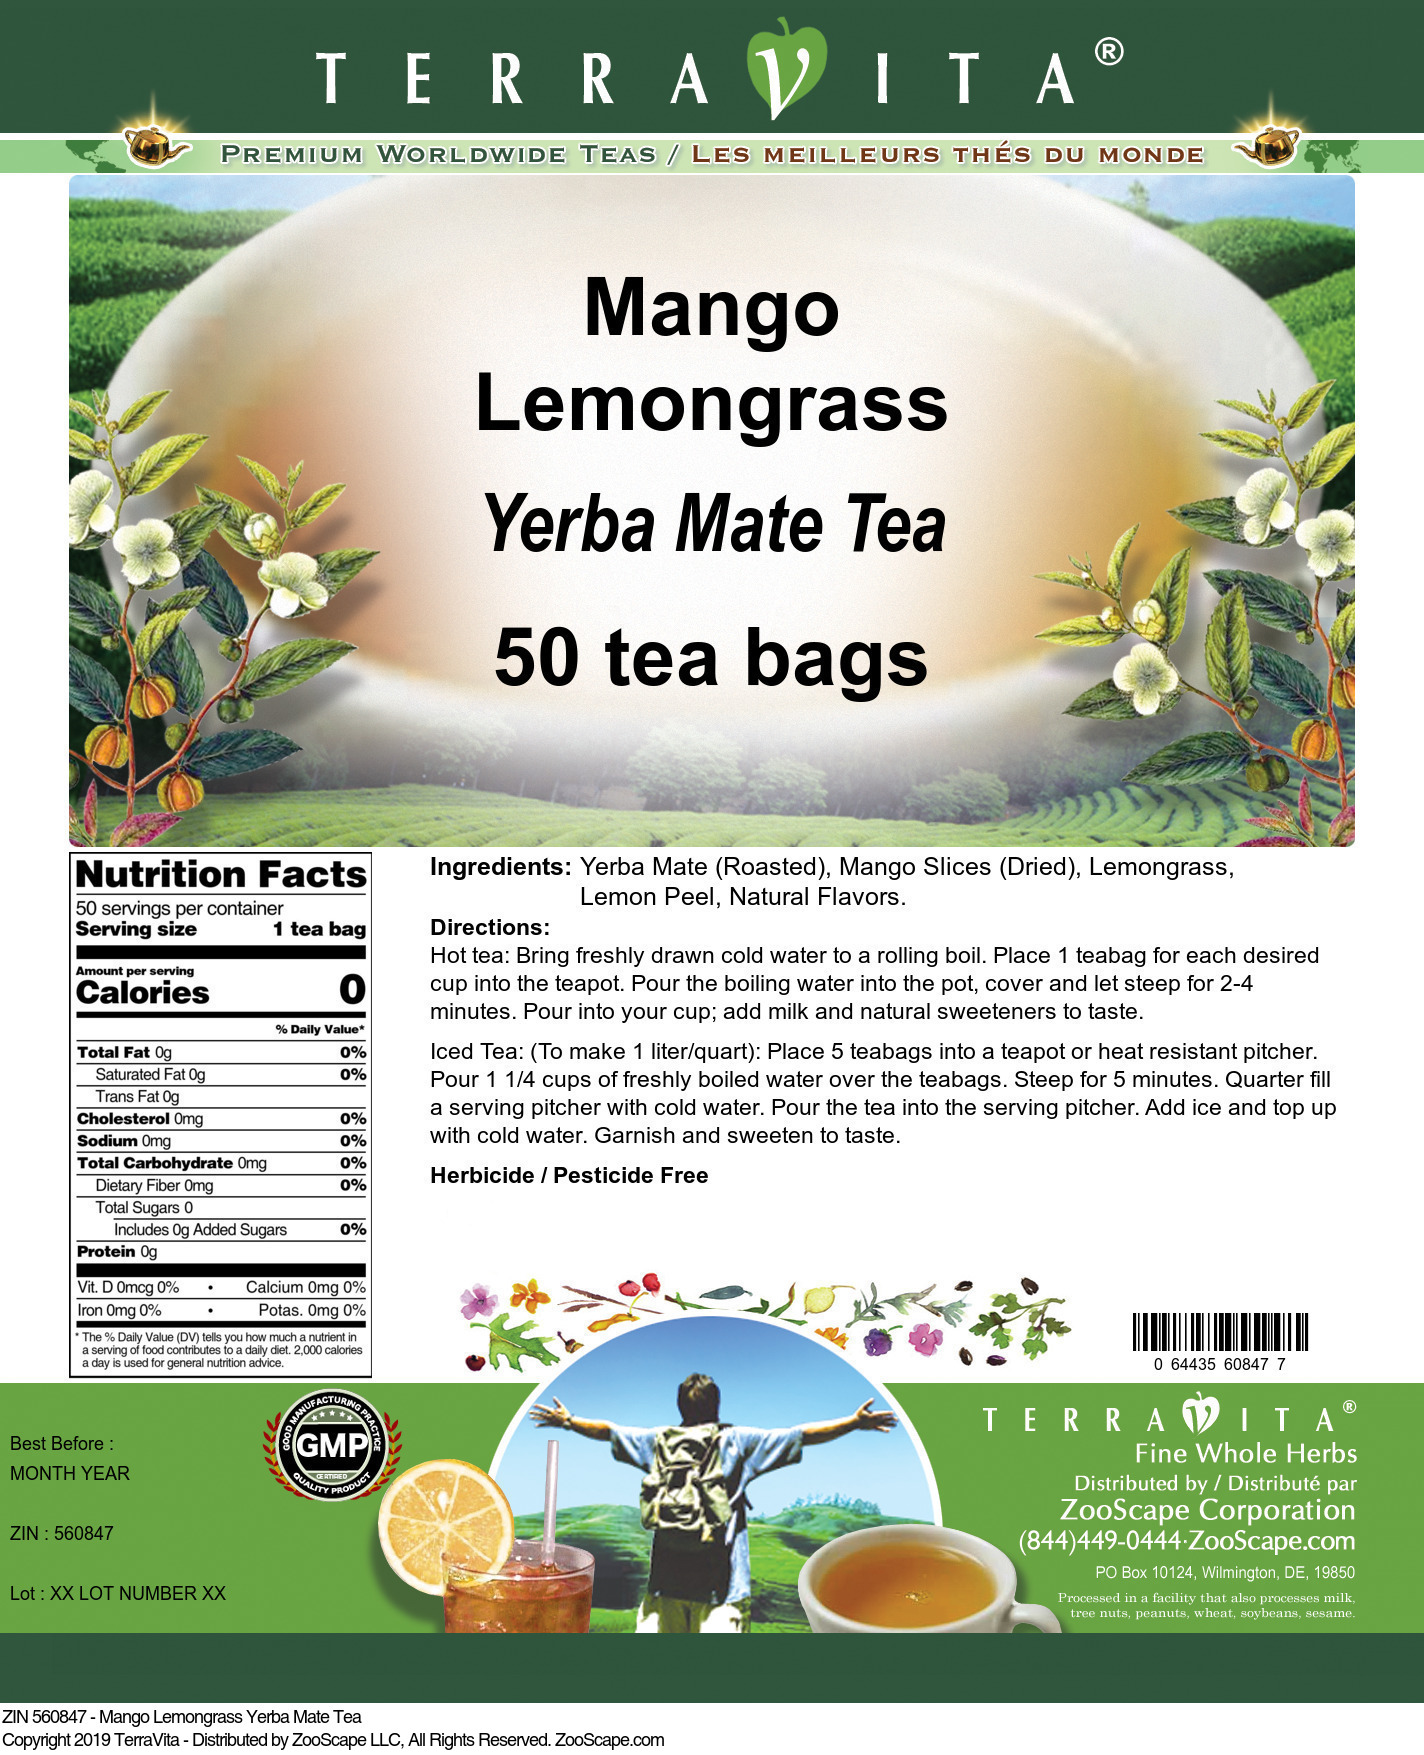 Mango Lemongrass Yerba Mate Tea